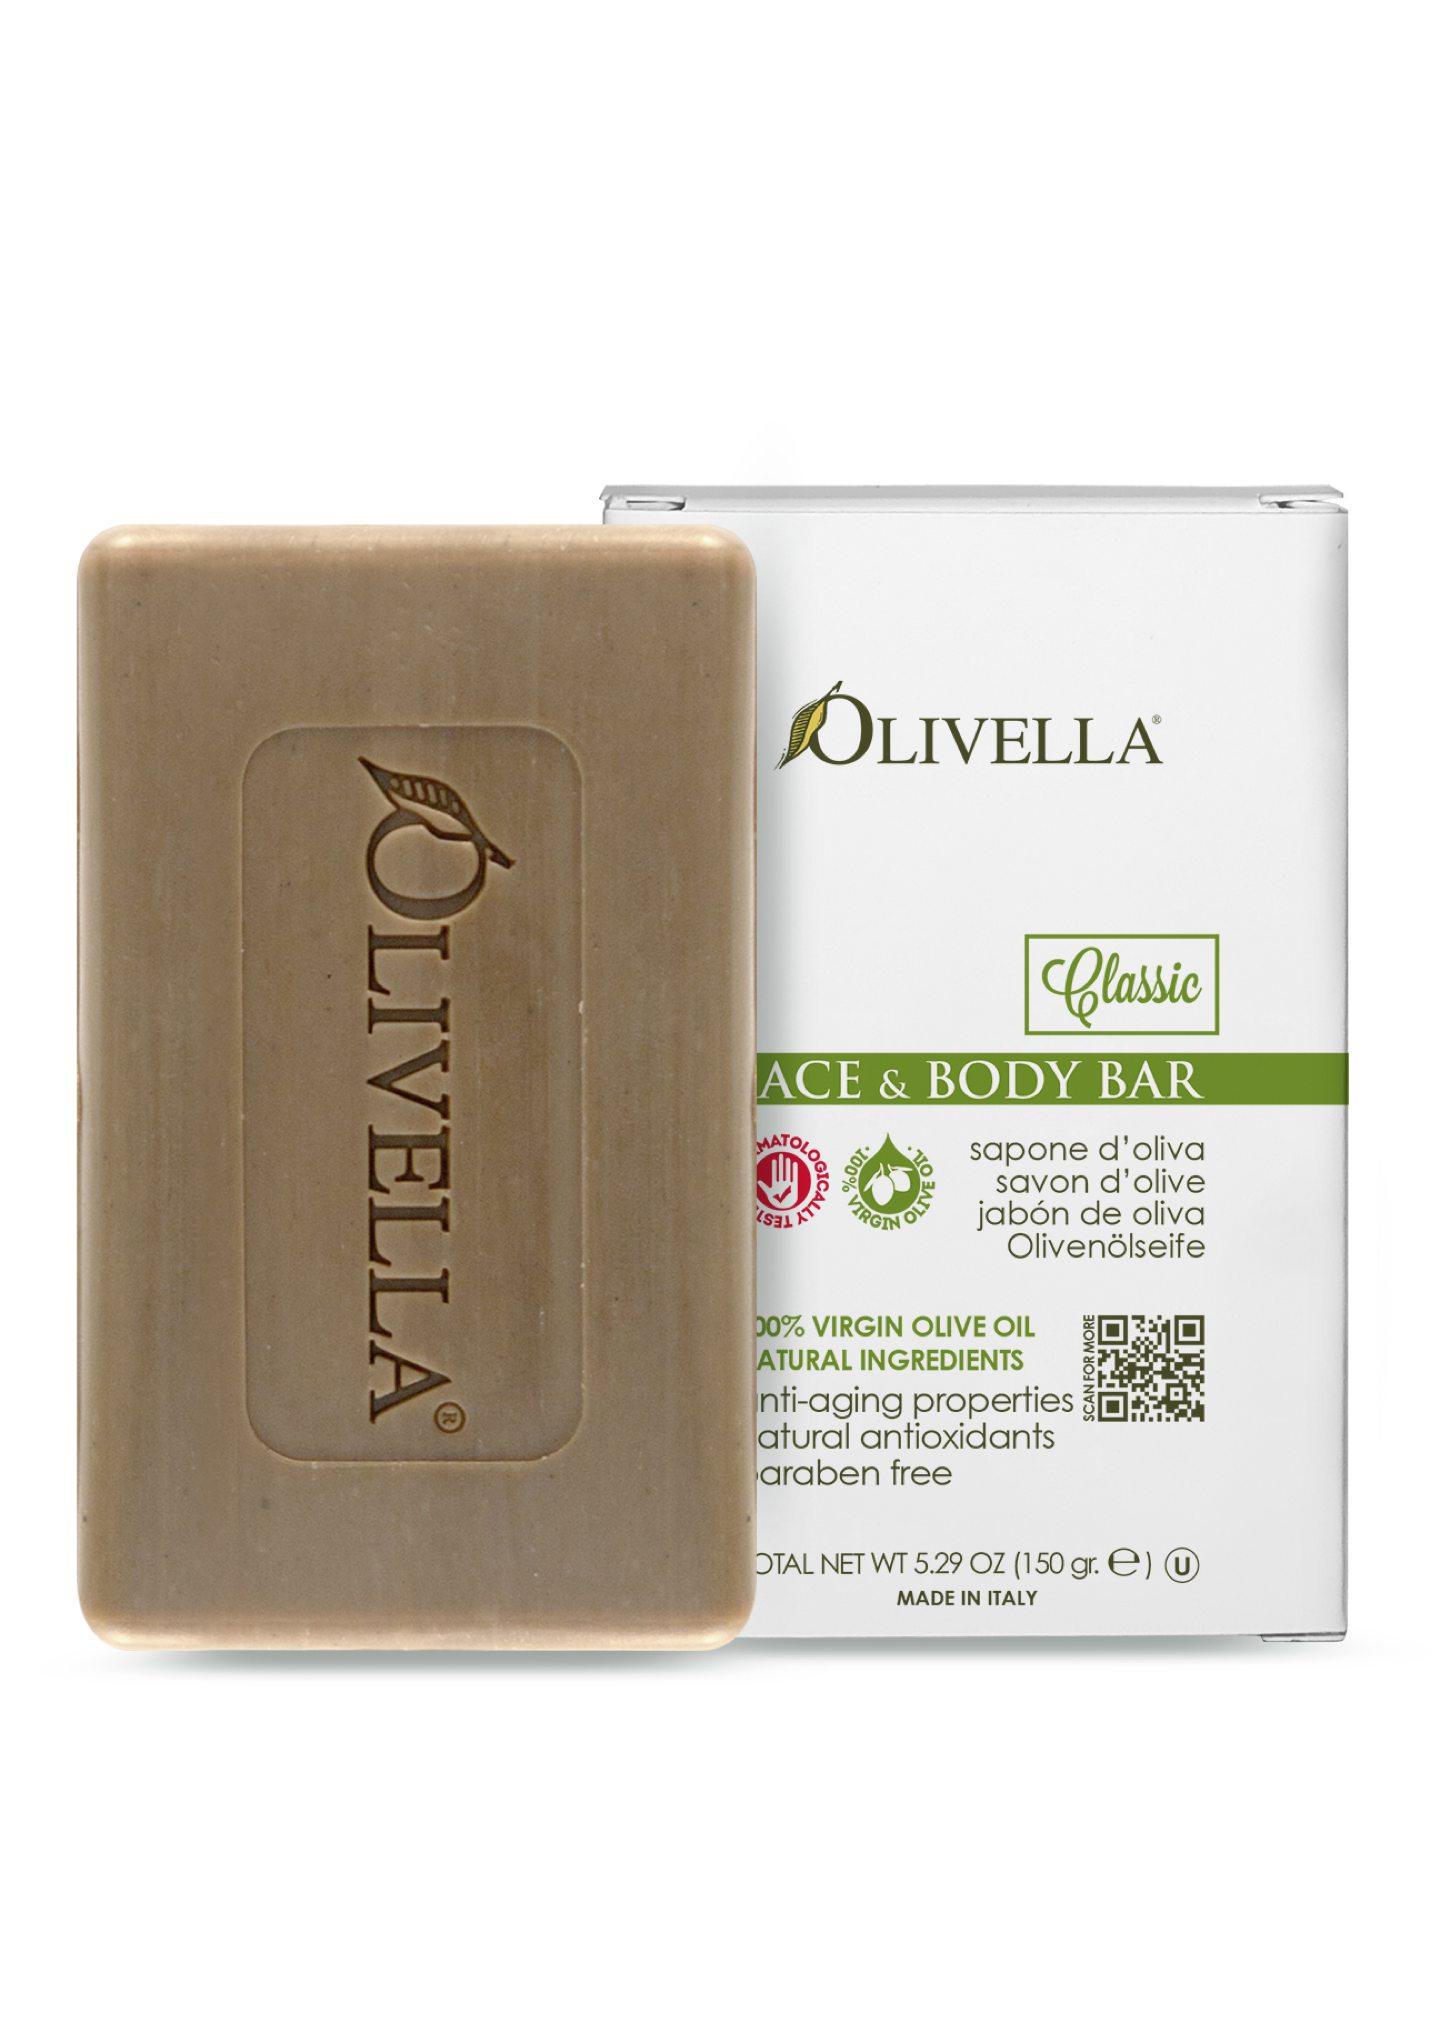 Olivella Face & Body Bar Soap - Classic Original